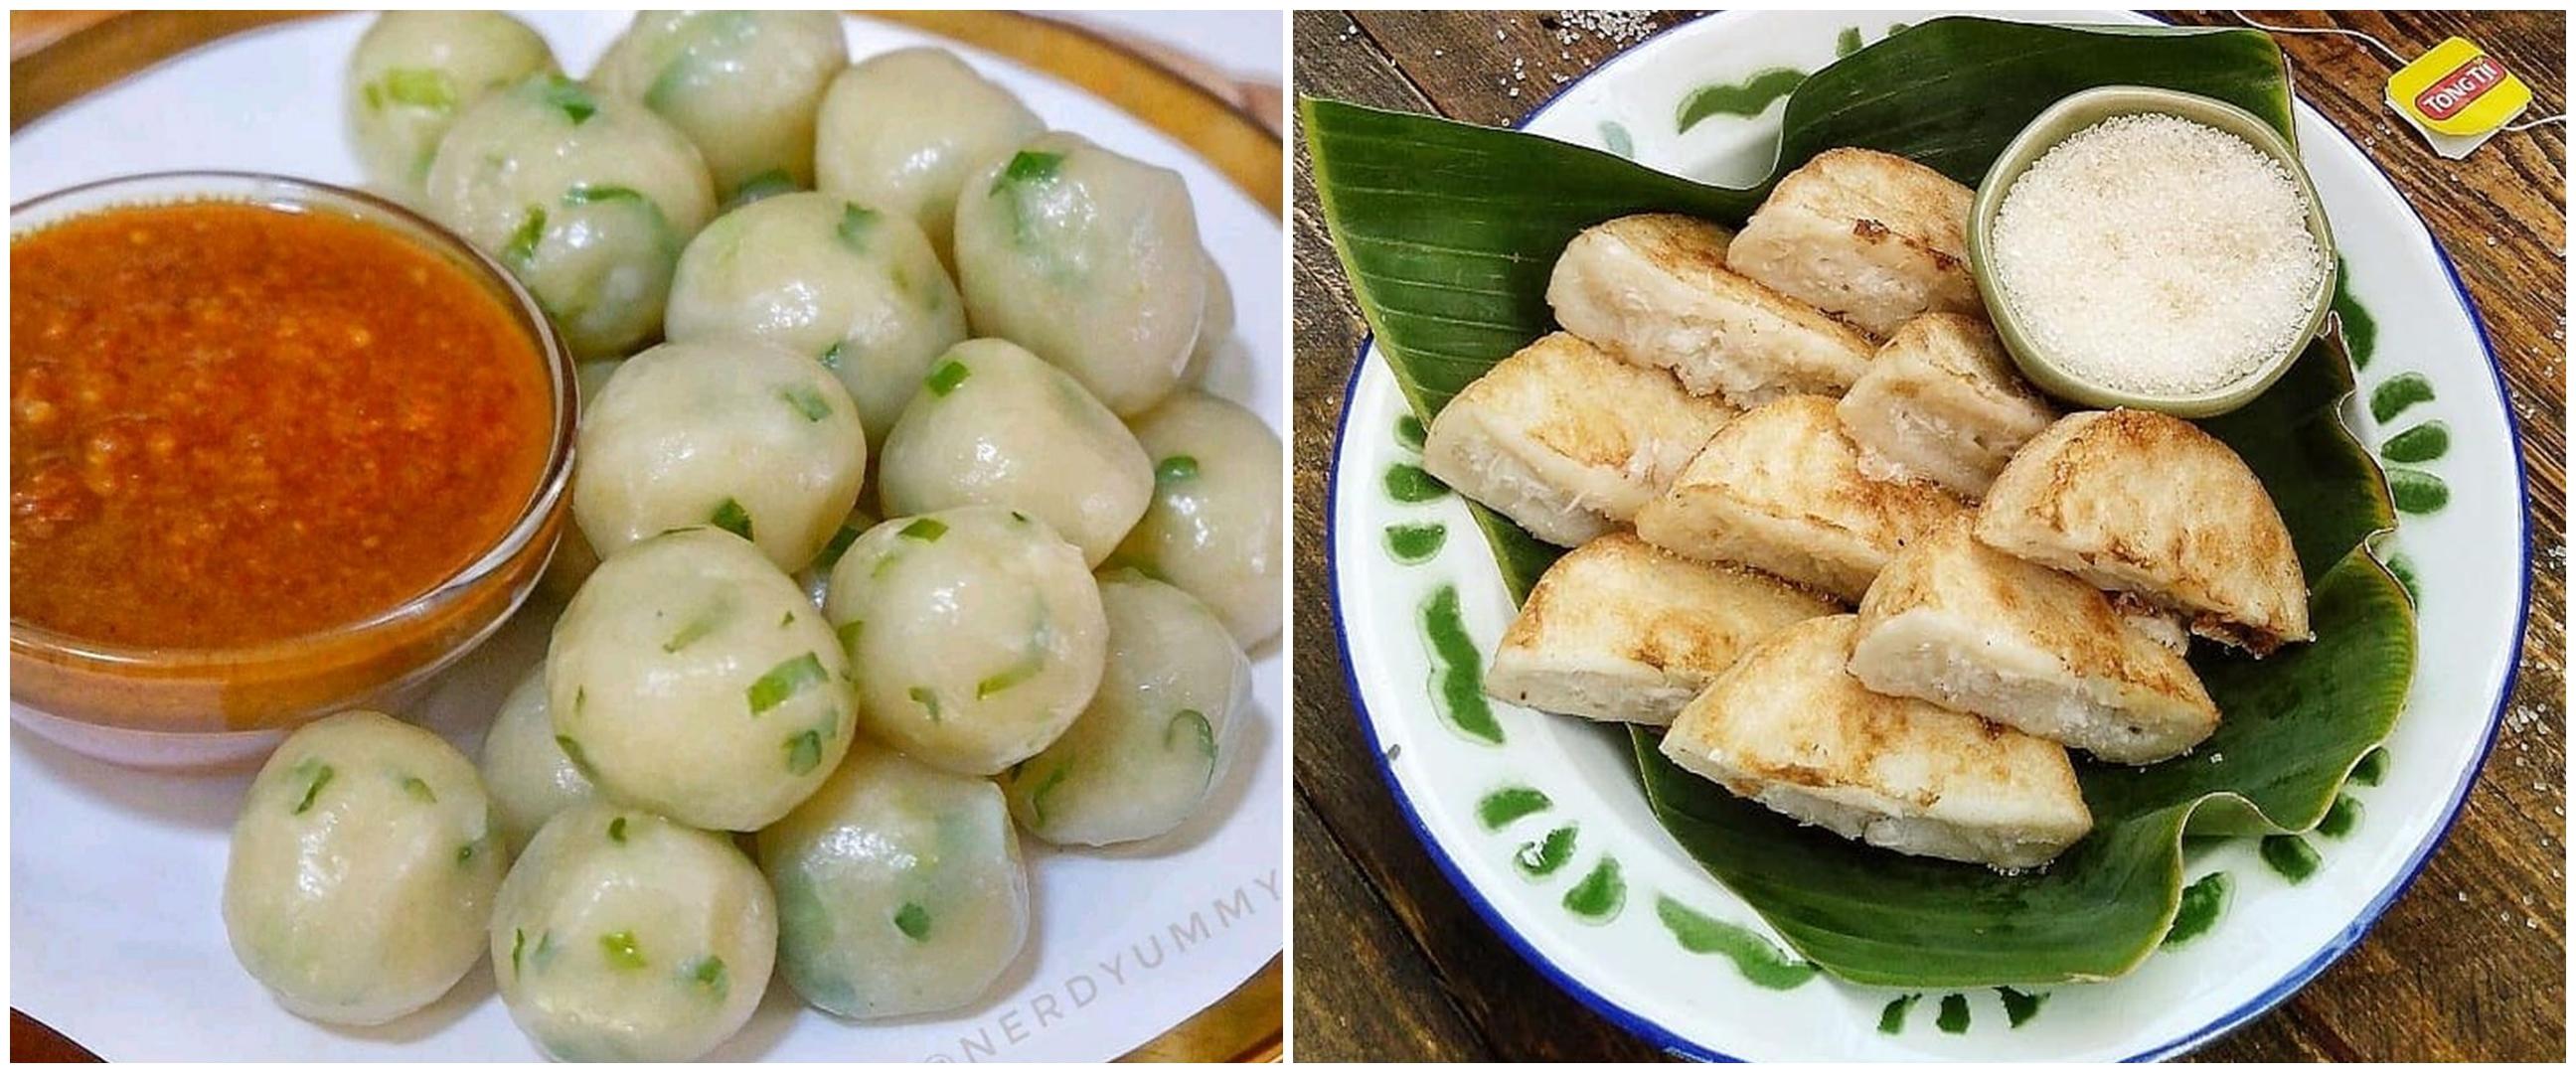 13 Resep camilan khas Bandung, enak dan mudah dibuat di rumah